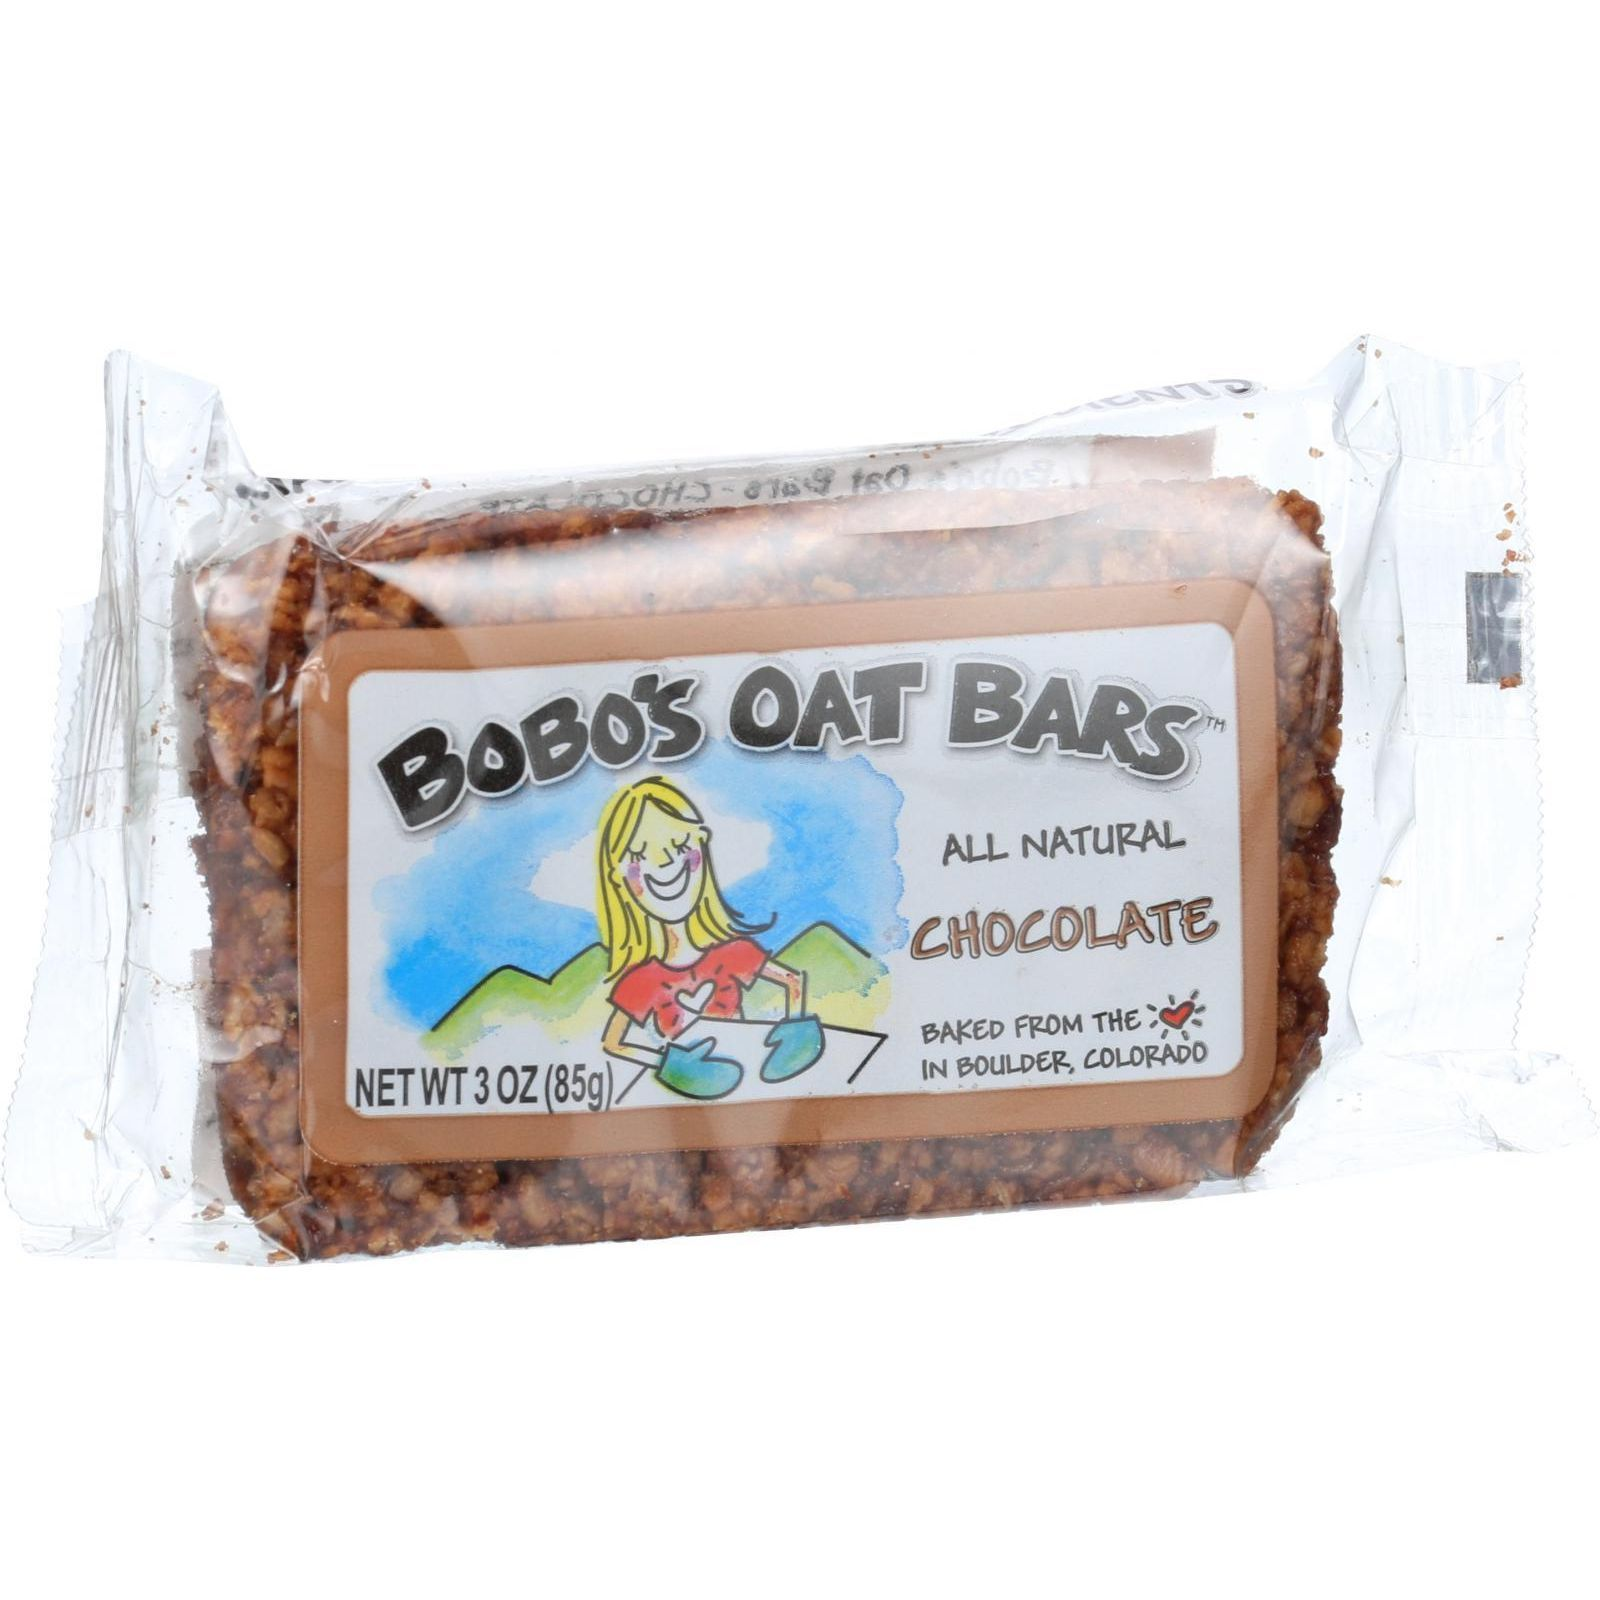 Bobo's Oat Bars - All Natural - Chocolate - 3 oz Bars - Case of 12